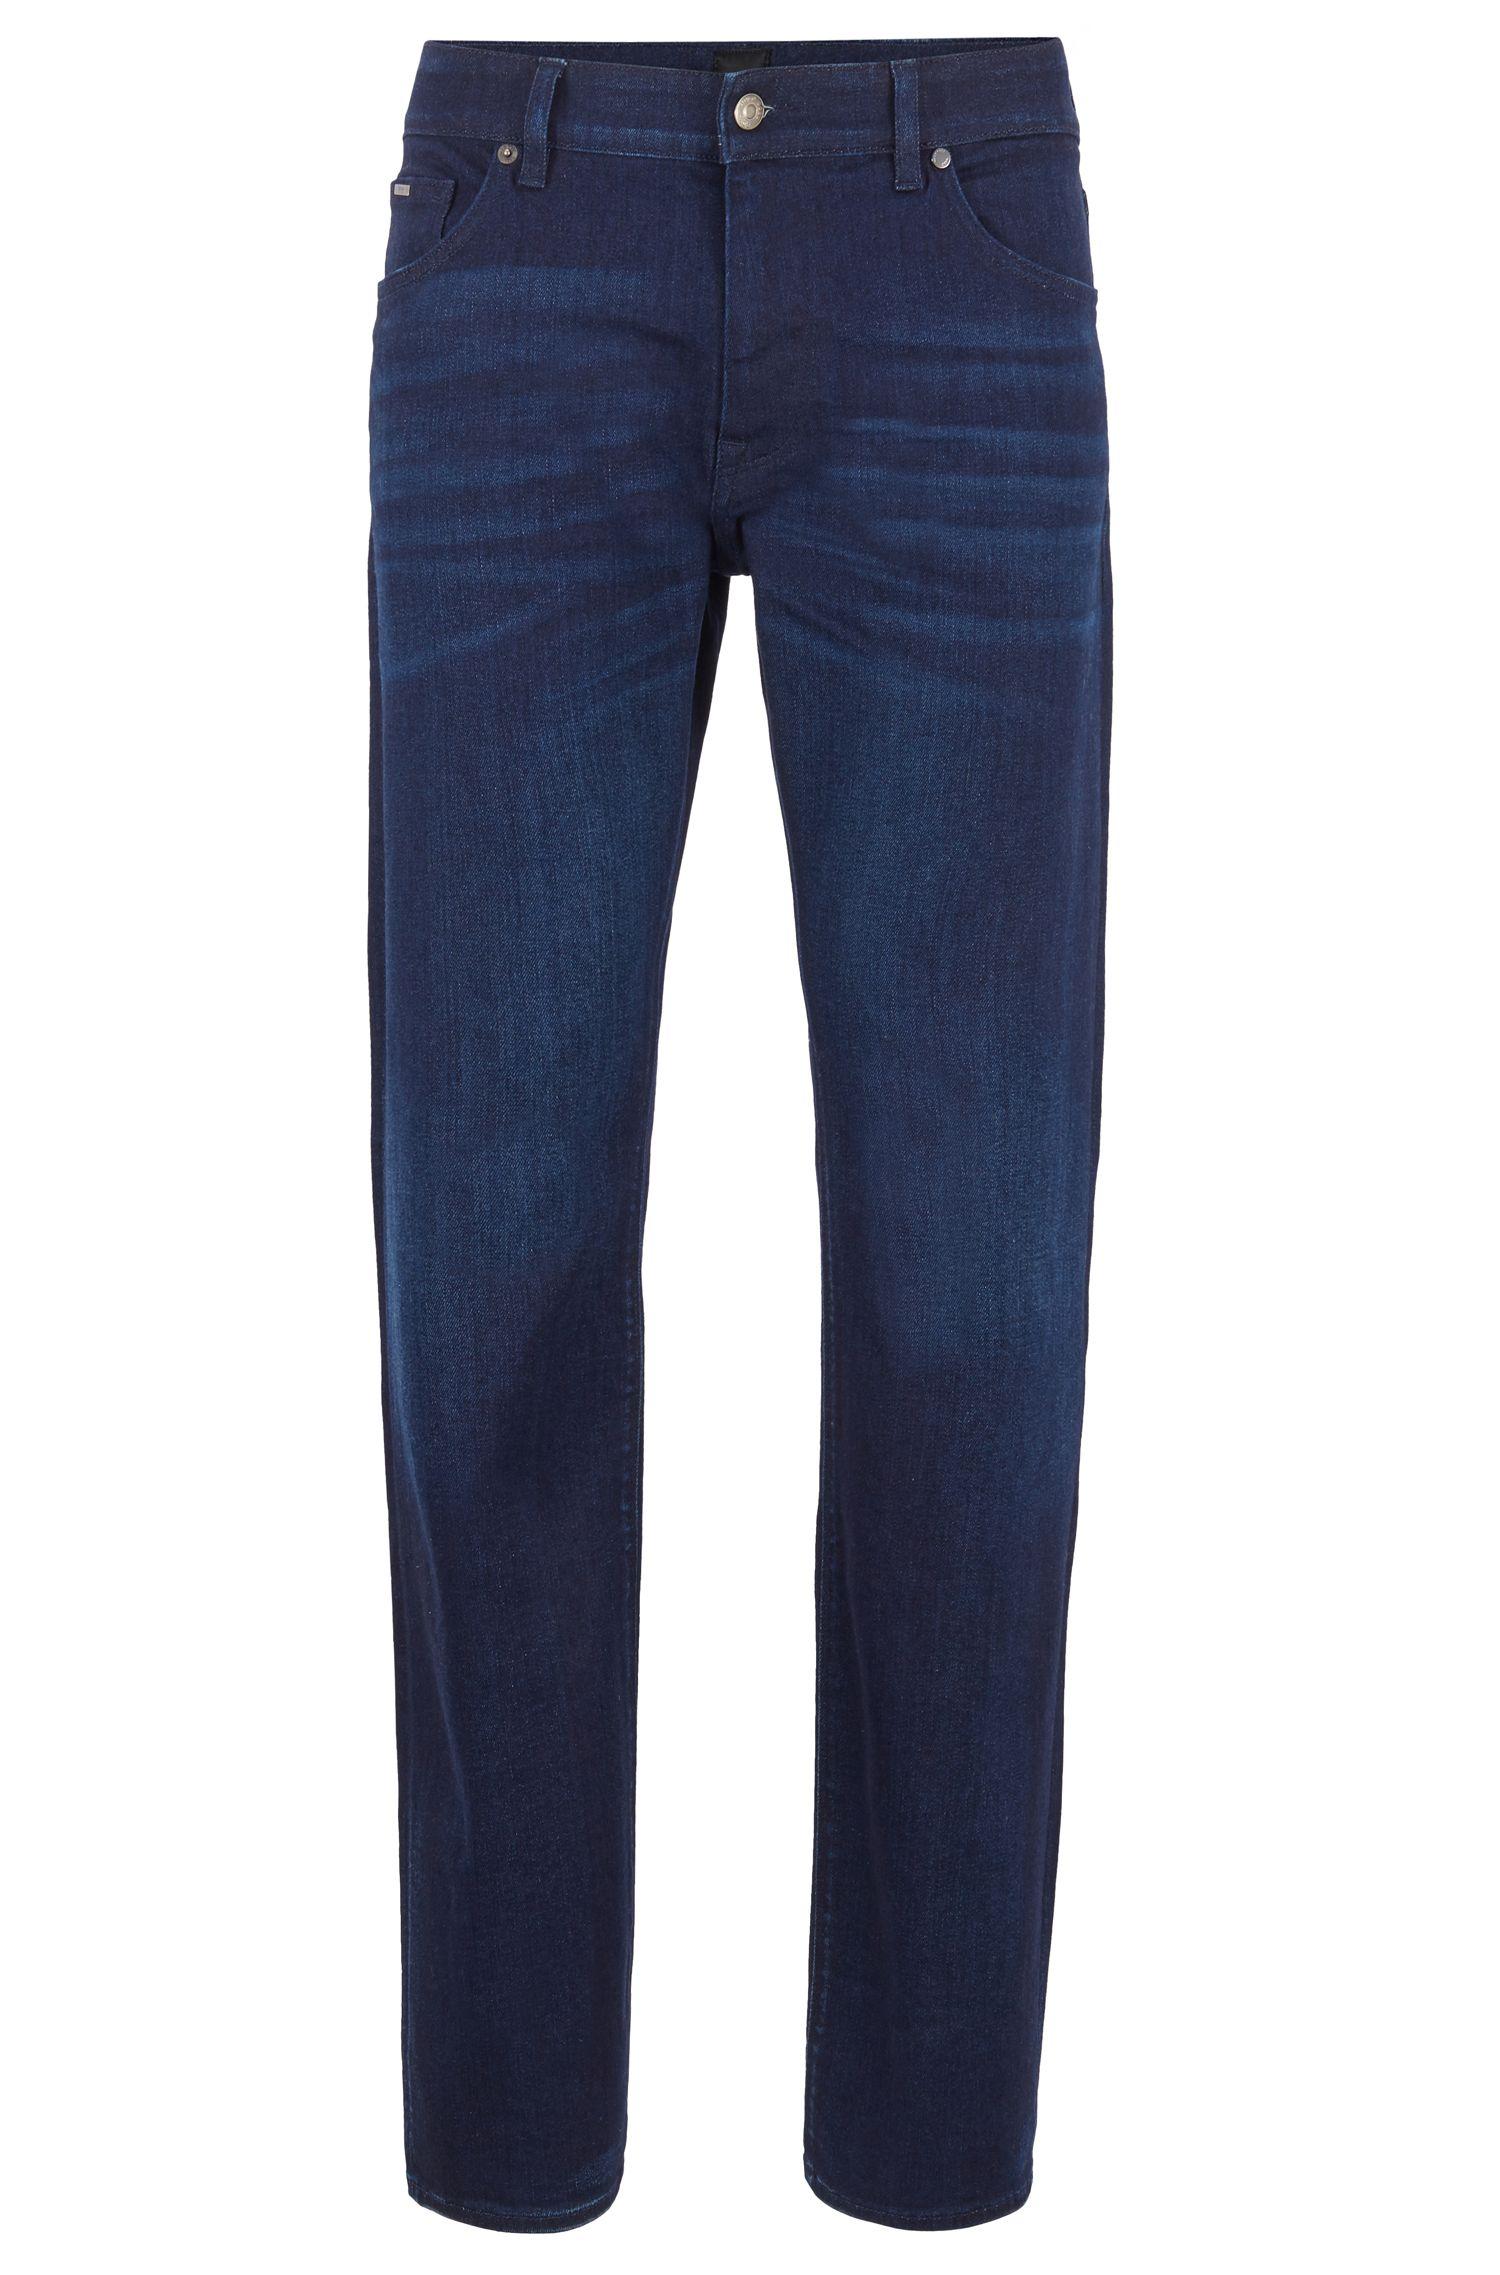 Jean Regular Fit en denim stretch italien bleu foncé, Bleu foncé